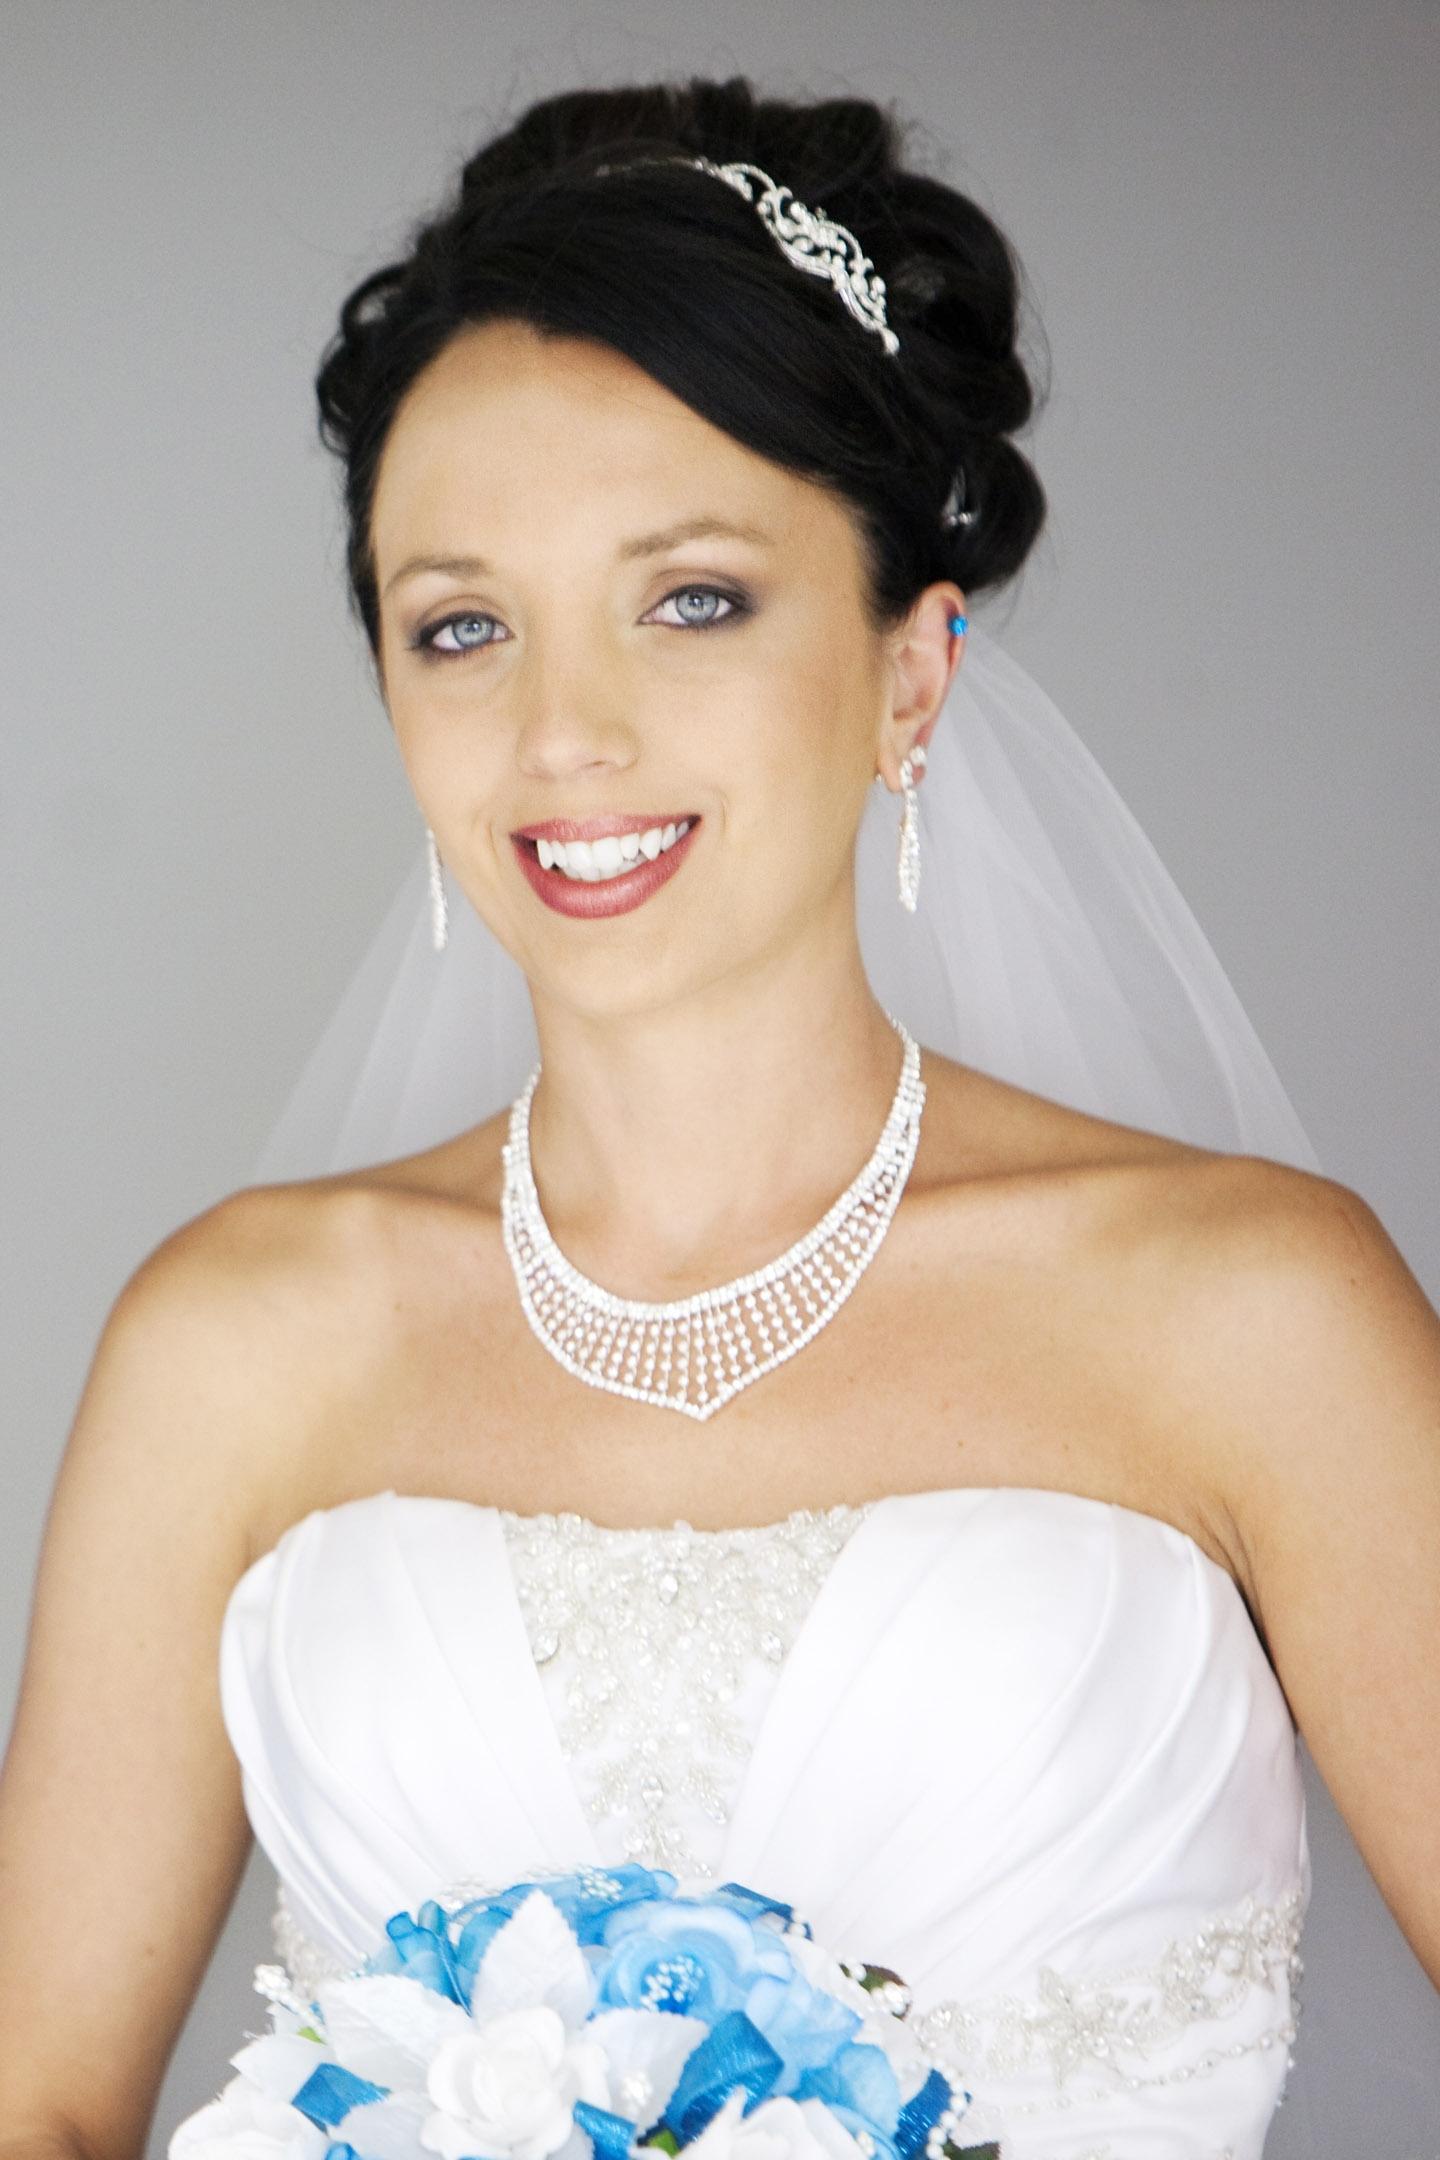 Magic Moments Bridal Amp Formal Wear Rapid City Sd 57701